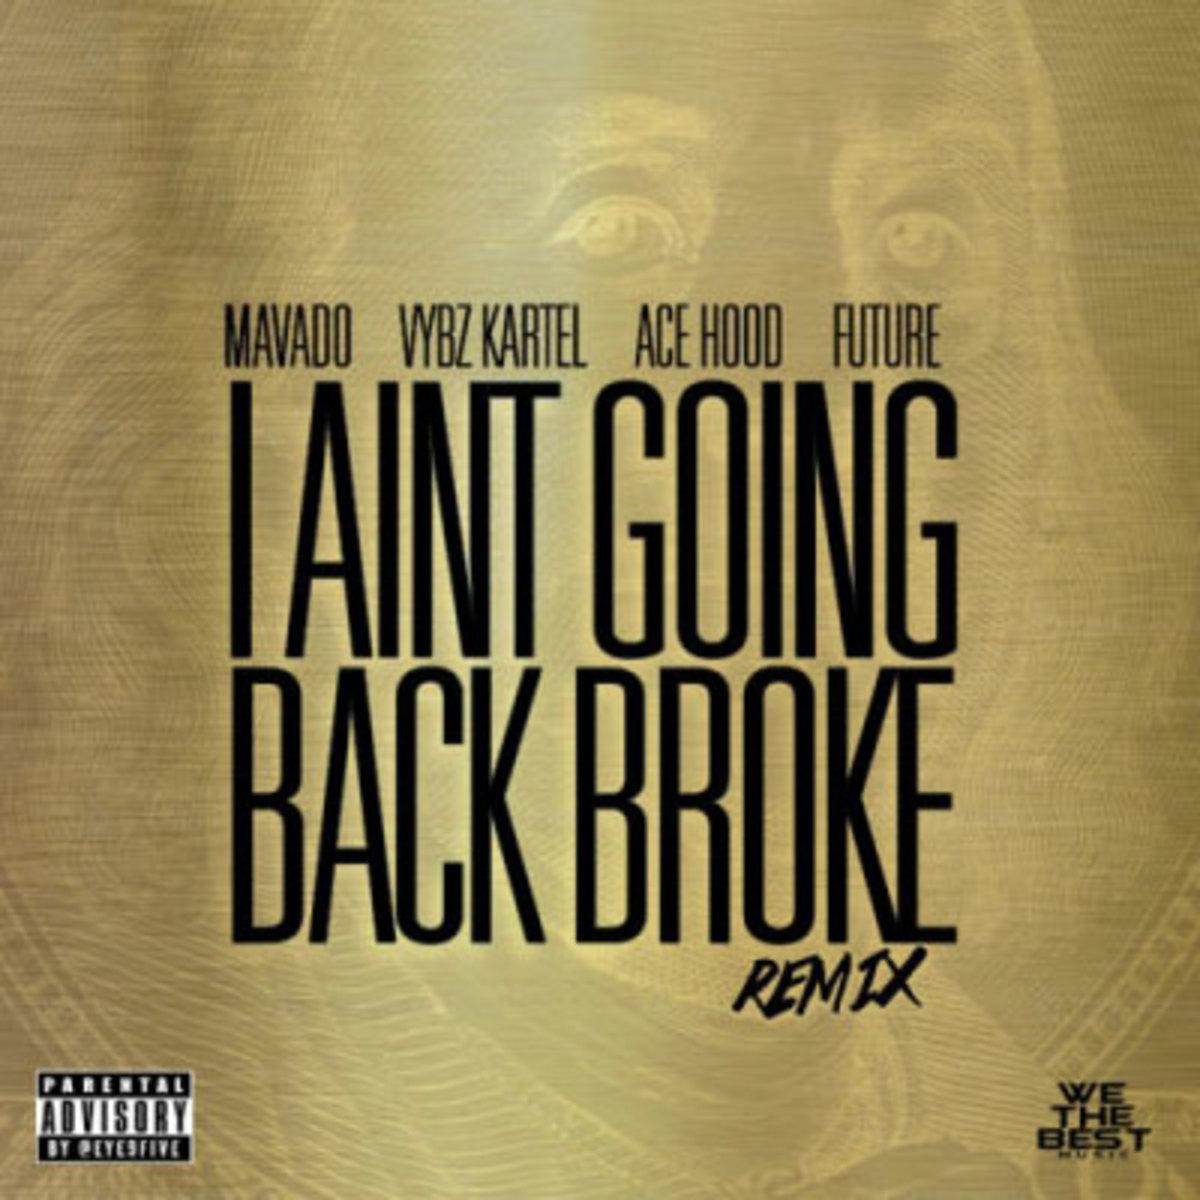 mavado-i-aint-going-back-broke-remix.jpg